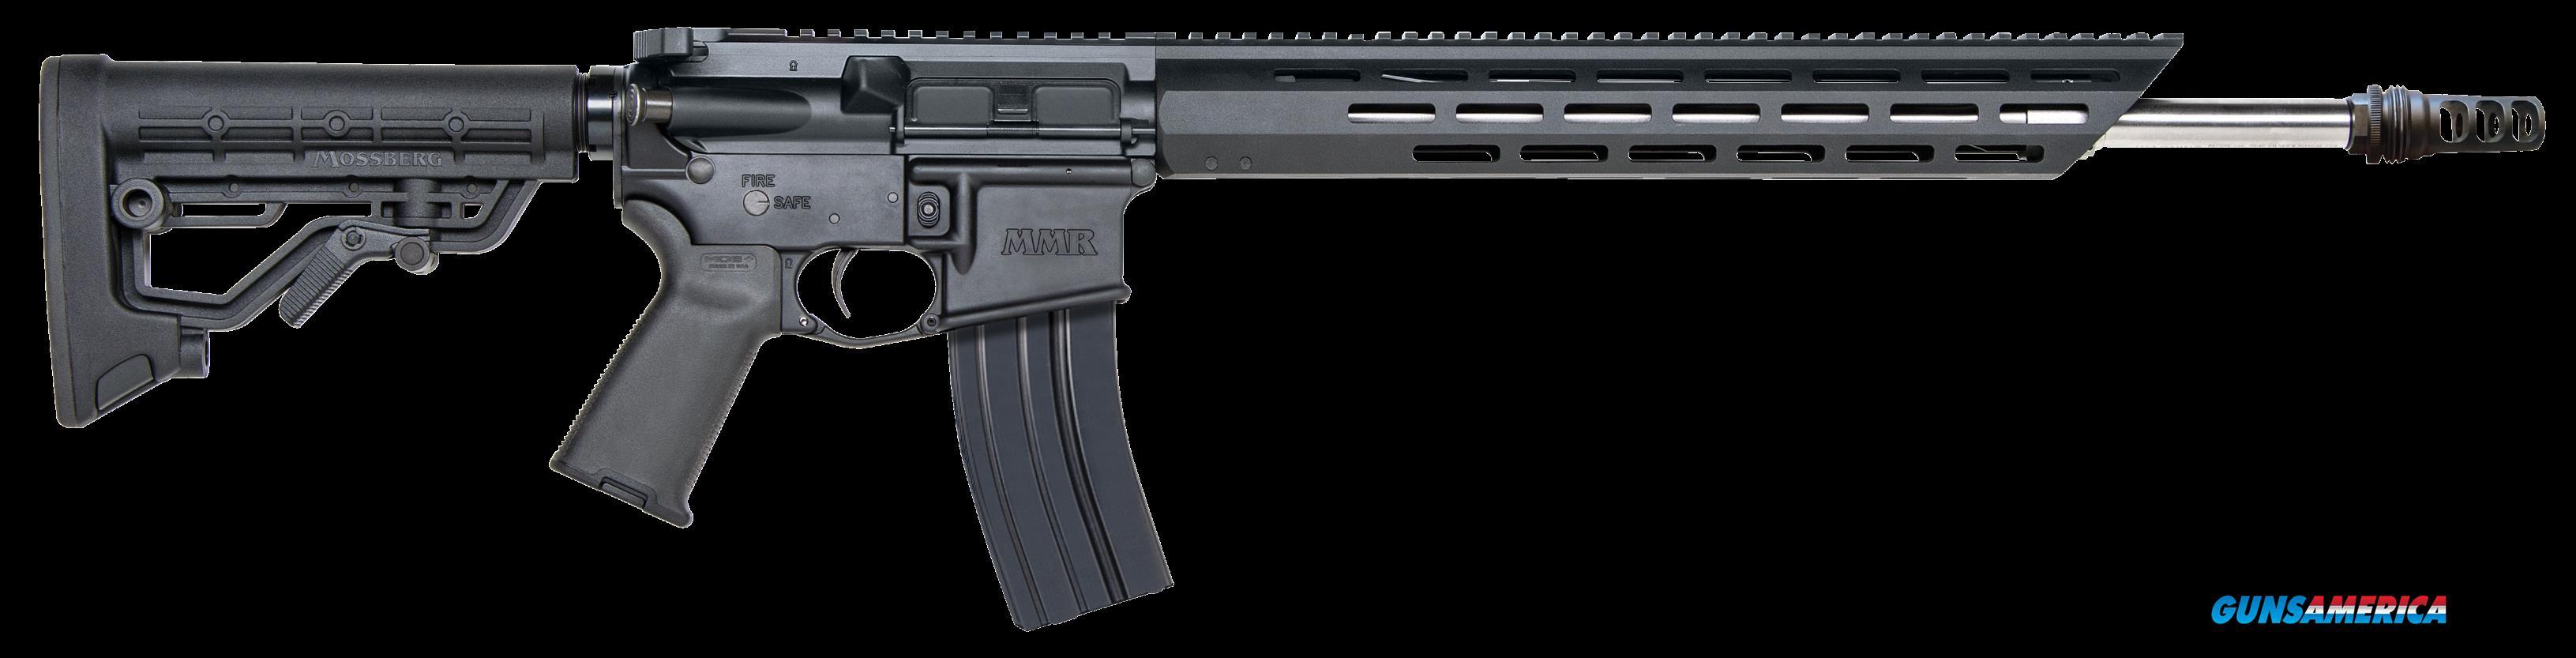 Mossberg Mmr, Moss 65082 Mmr Pro 224vlk Mlok 18 28+1  Guns > Pistols > 1911 Pistol Copies (non-Colt)